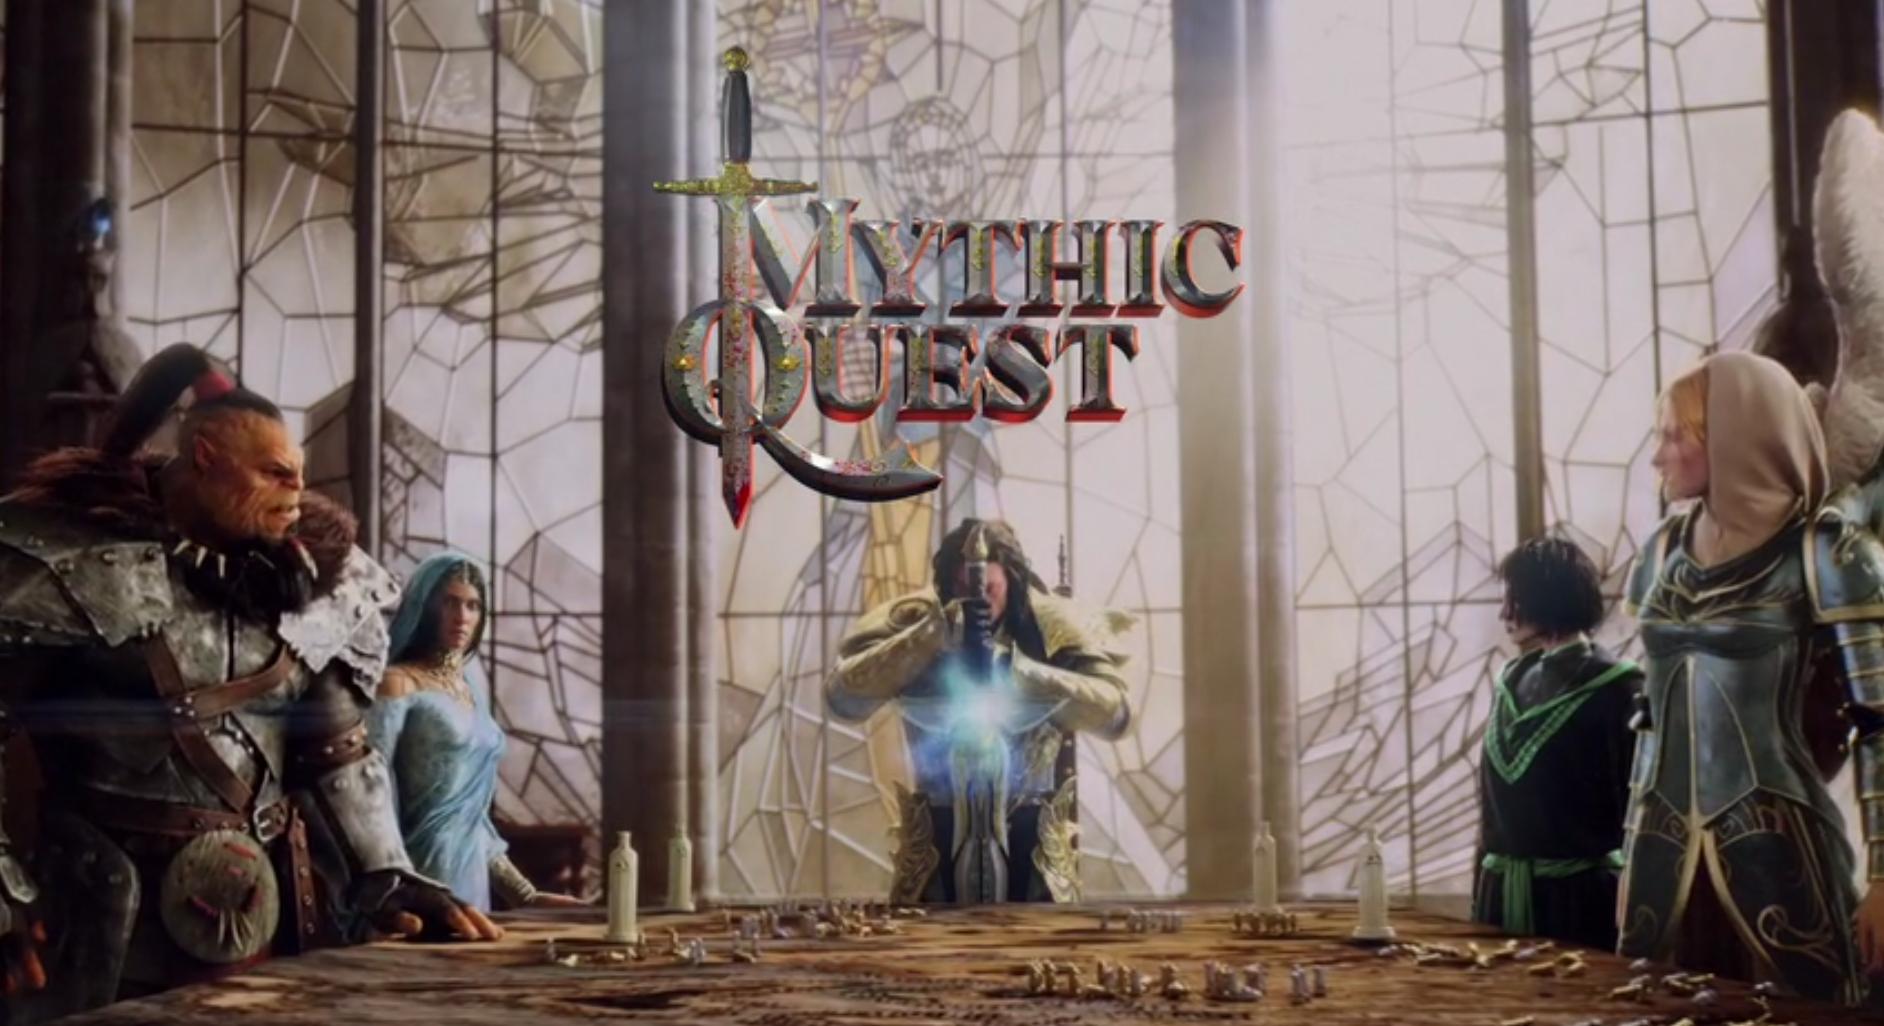 Mythic Quest (game) | Mythic Quest Wiki | Fandom